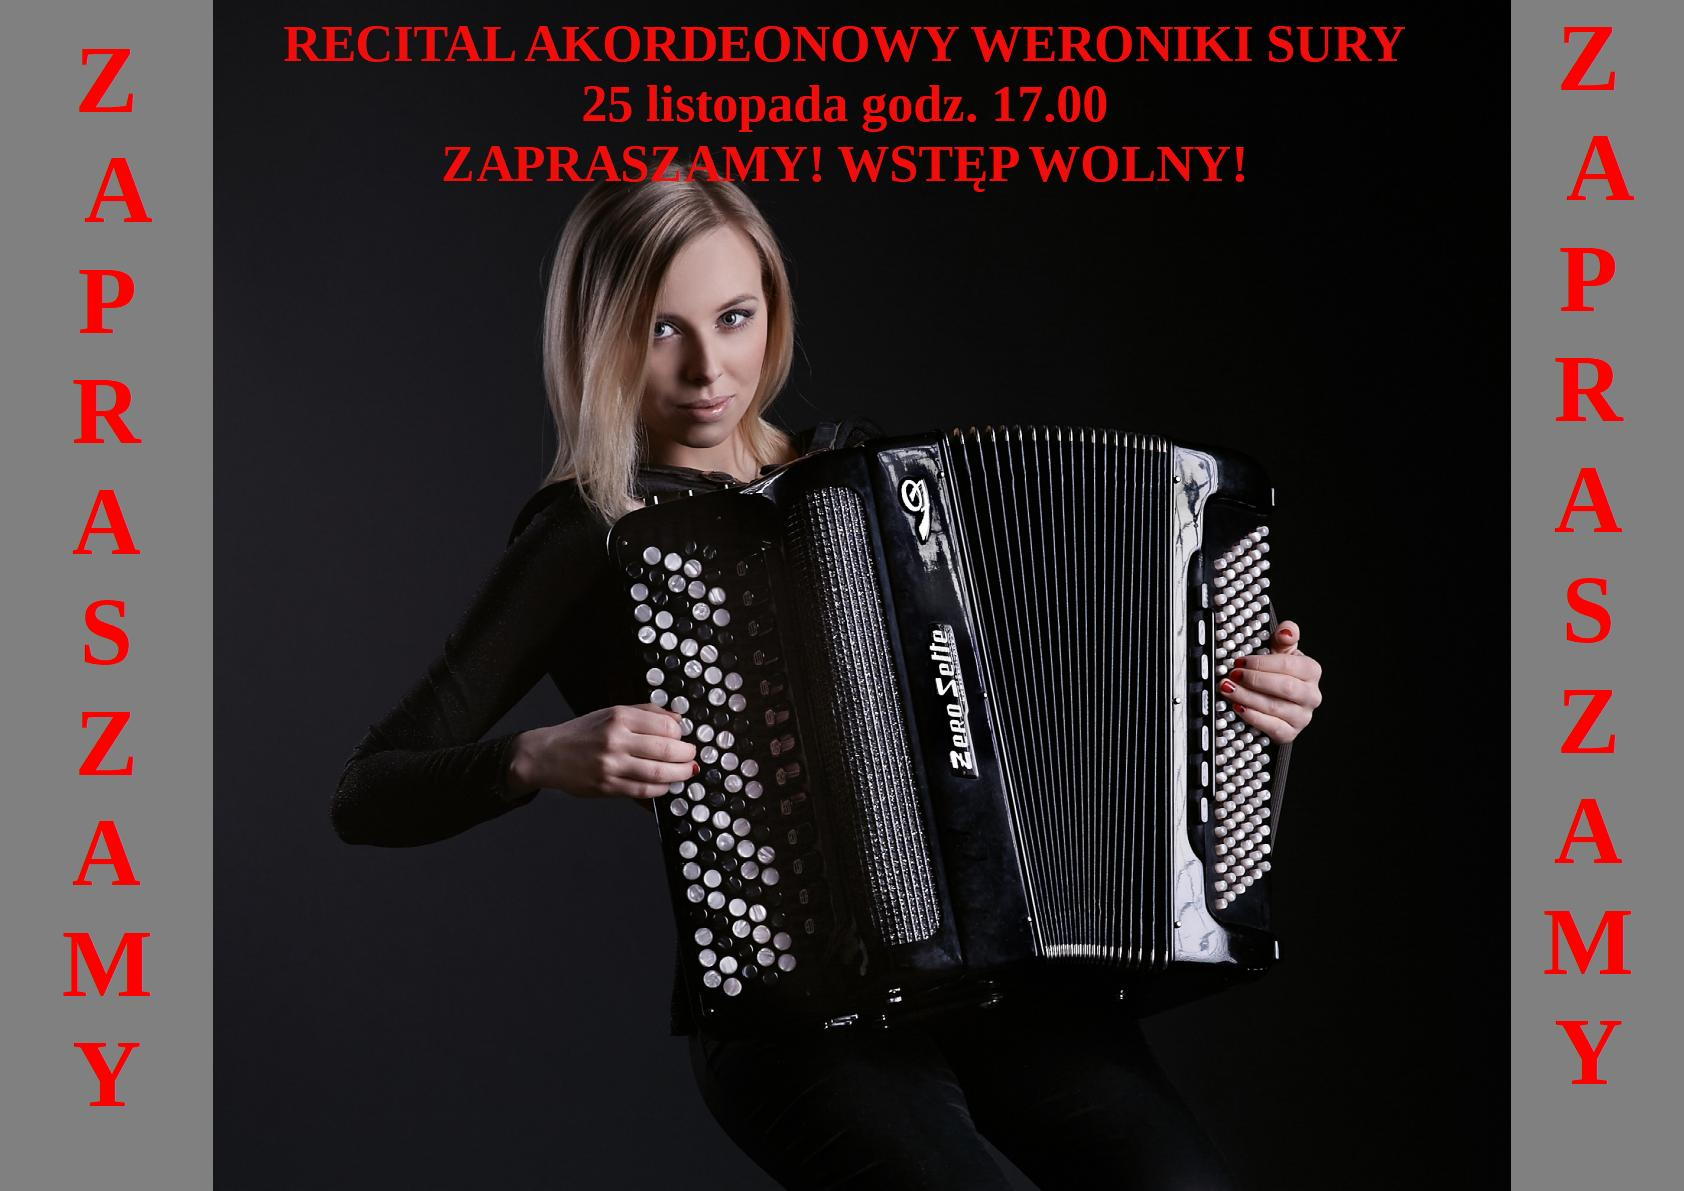 Recital Akordeonowy Weroniki Sury